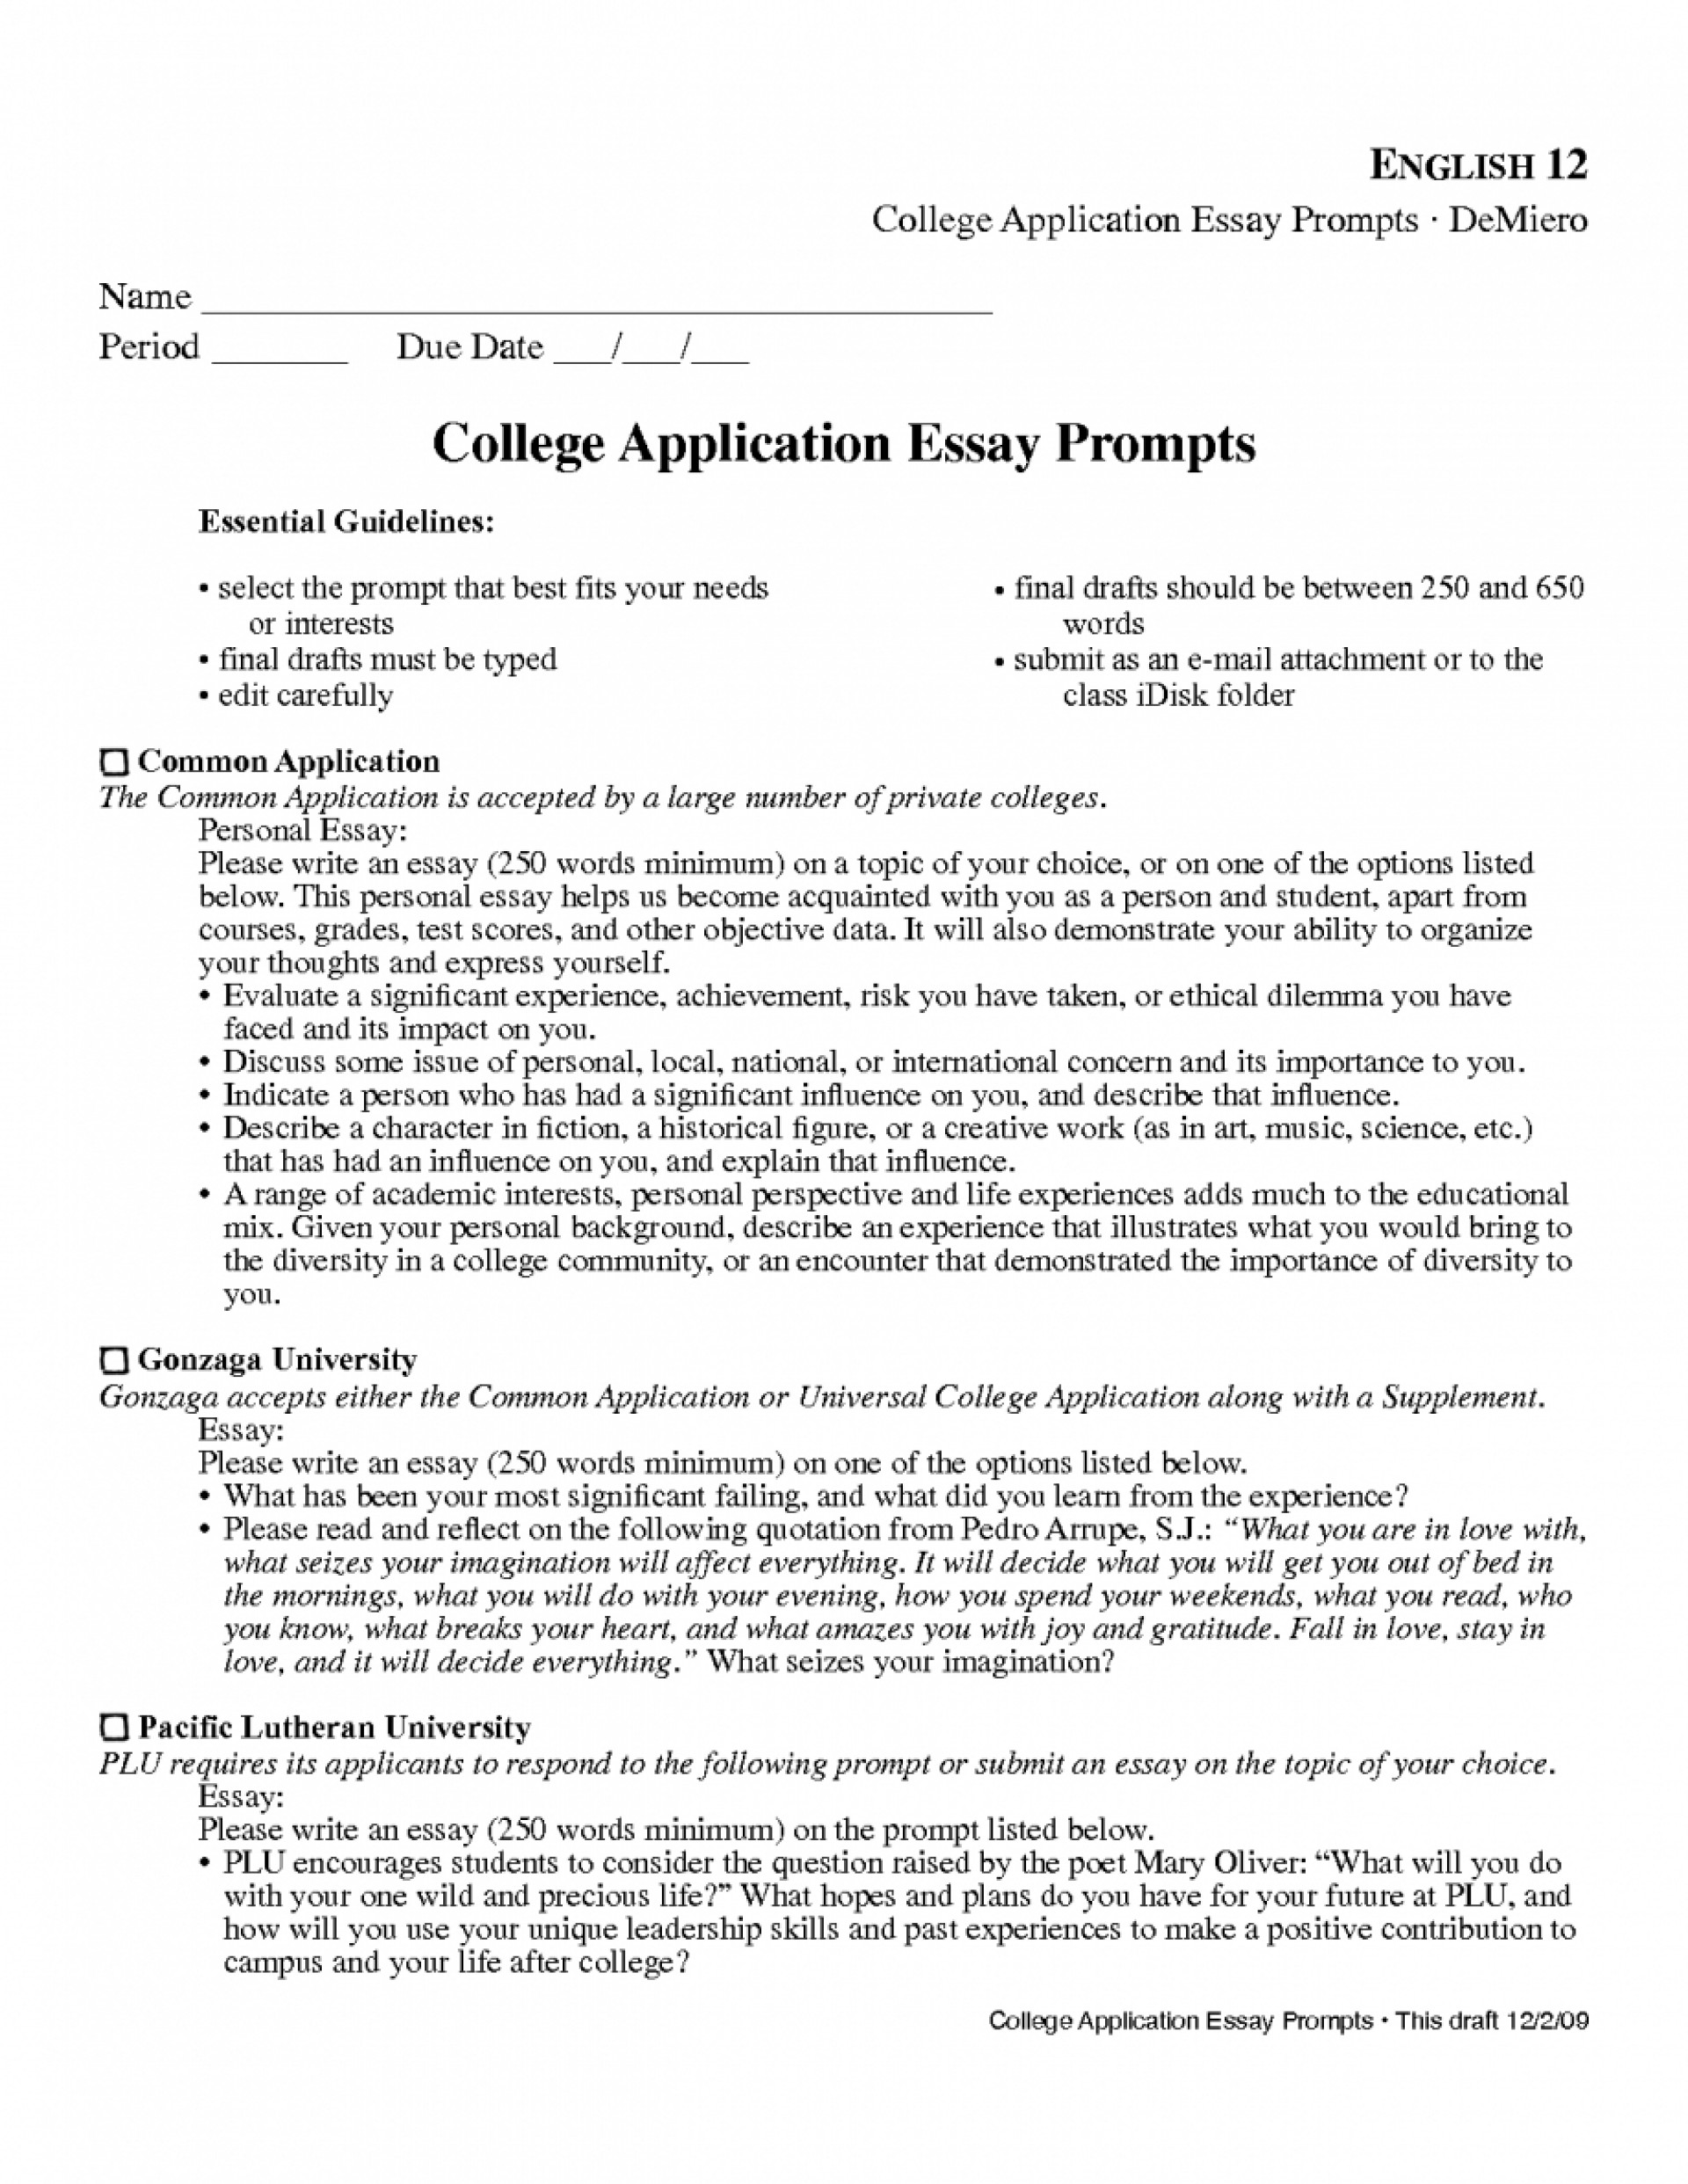 004 Uw Essay Prompt Custom College Essays University Of Wisconsin Madison Bests L Fascinating La Crosse Prompts 2019 Bothell 1920